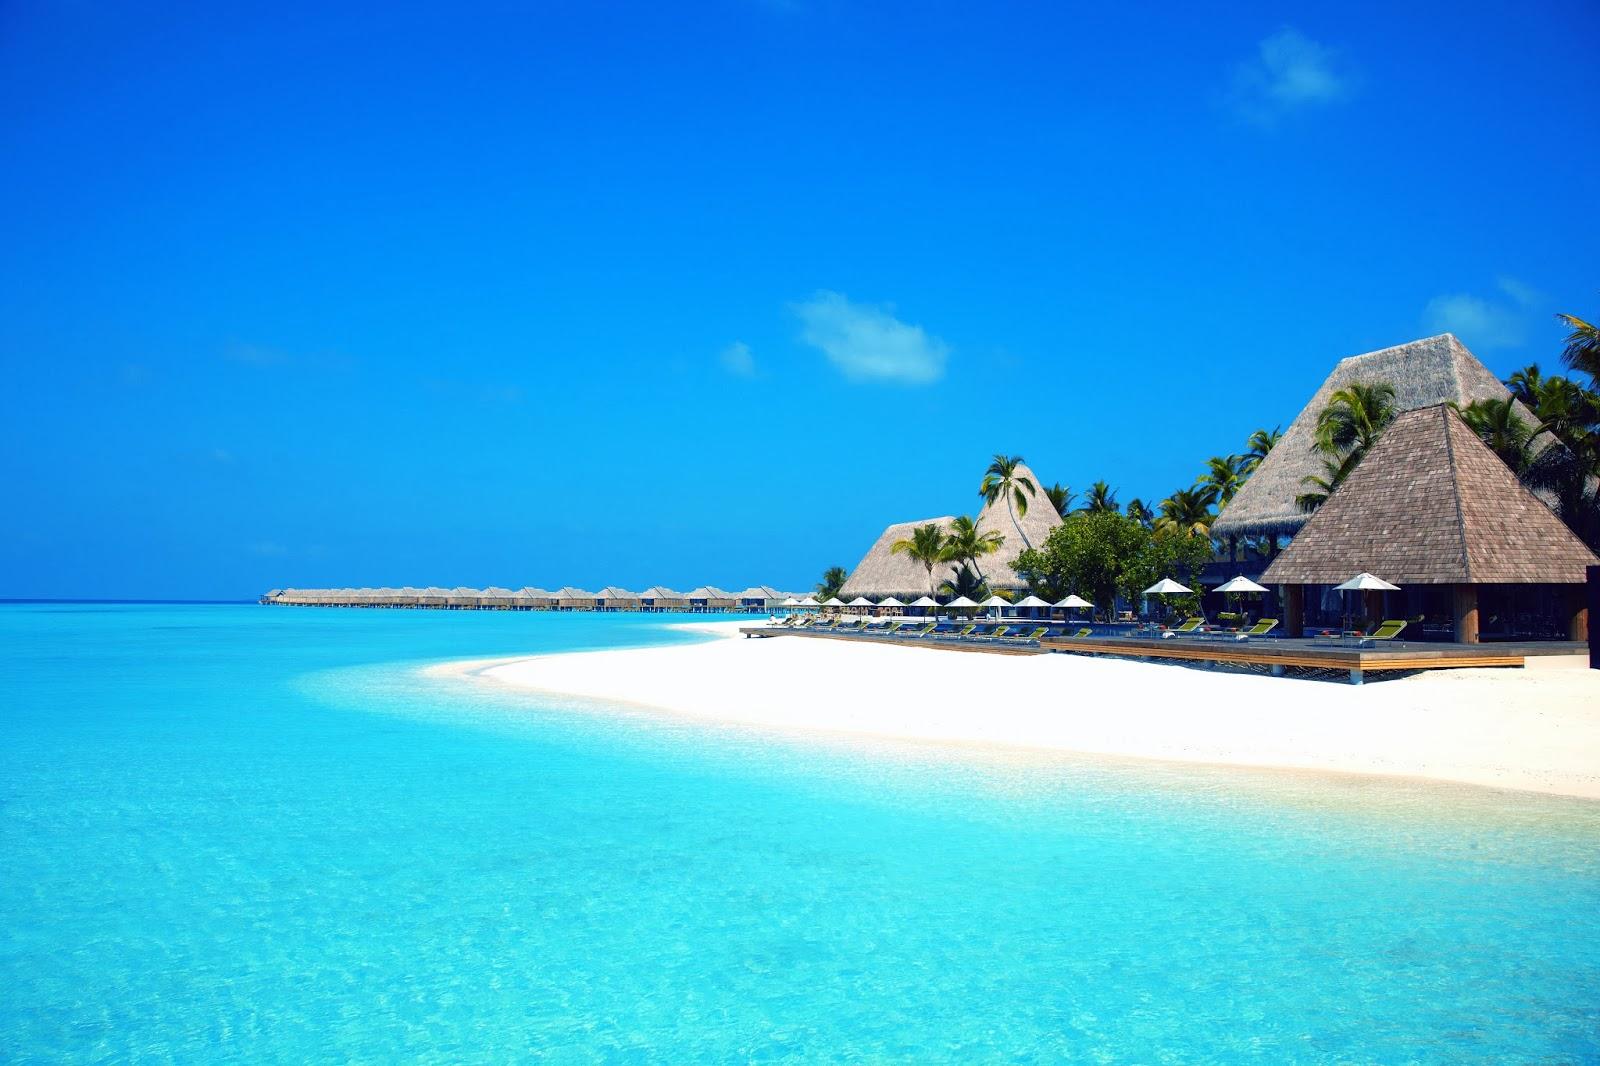 Maldives Beach Hd Wallpaper: INVESTIMENTO EM VALOR: LUA DE MEL